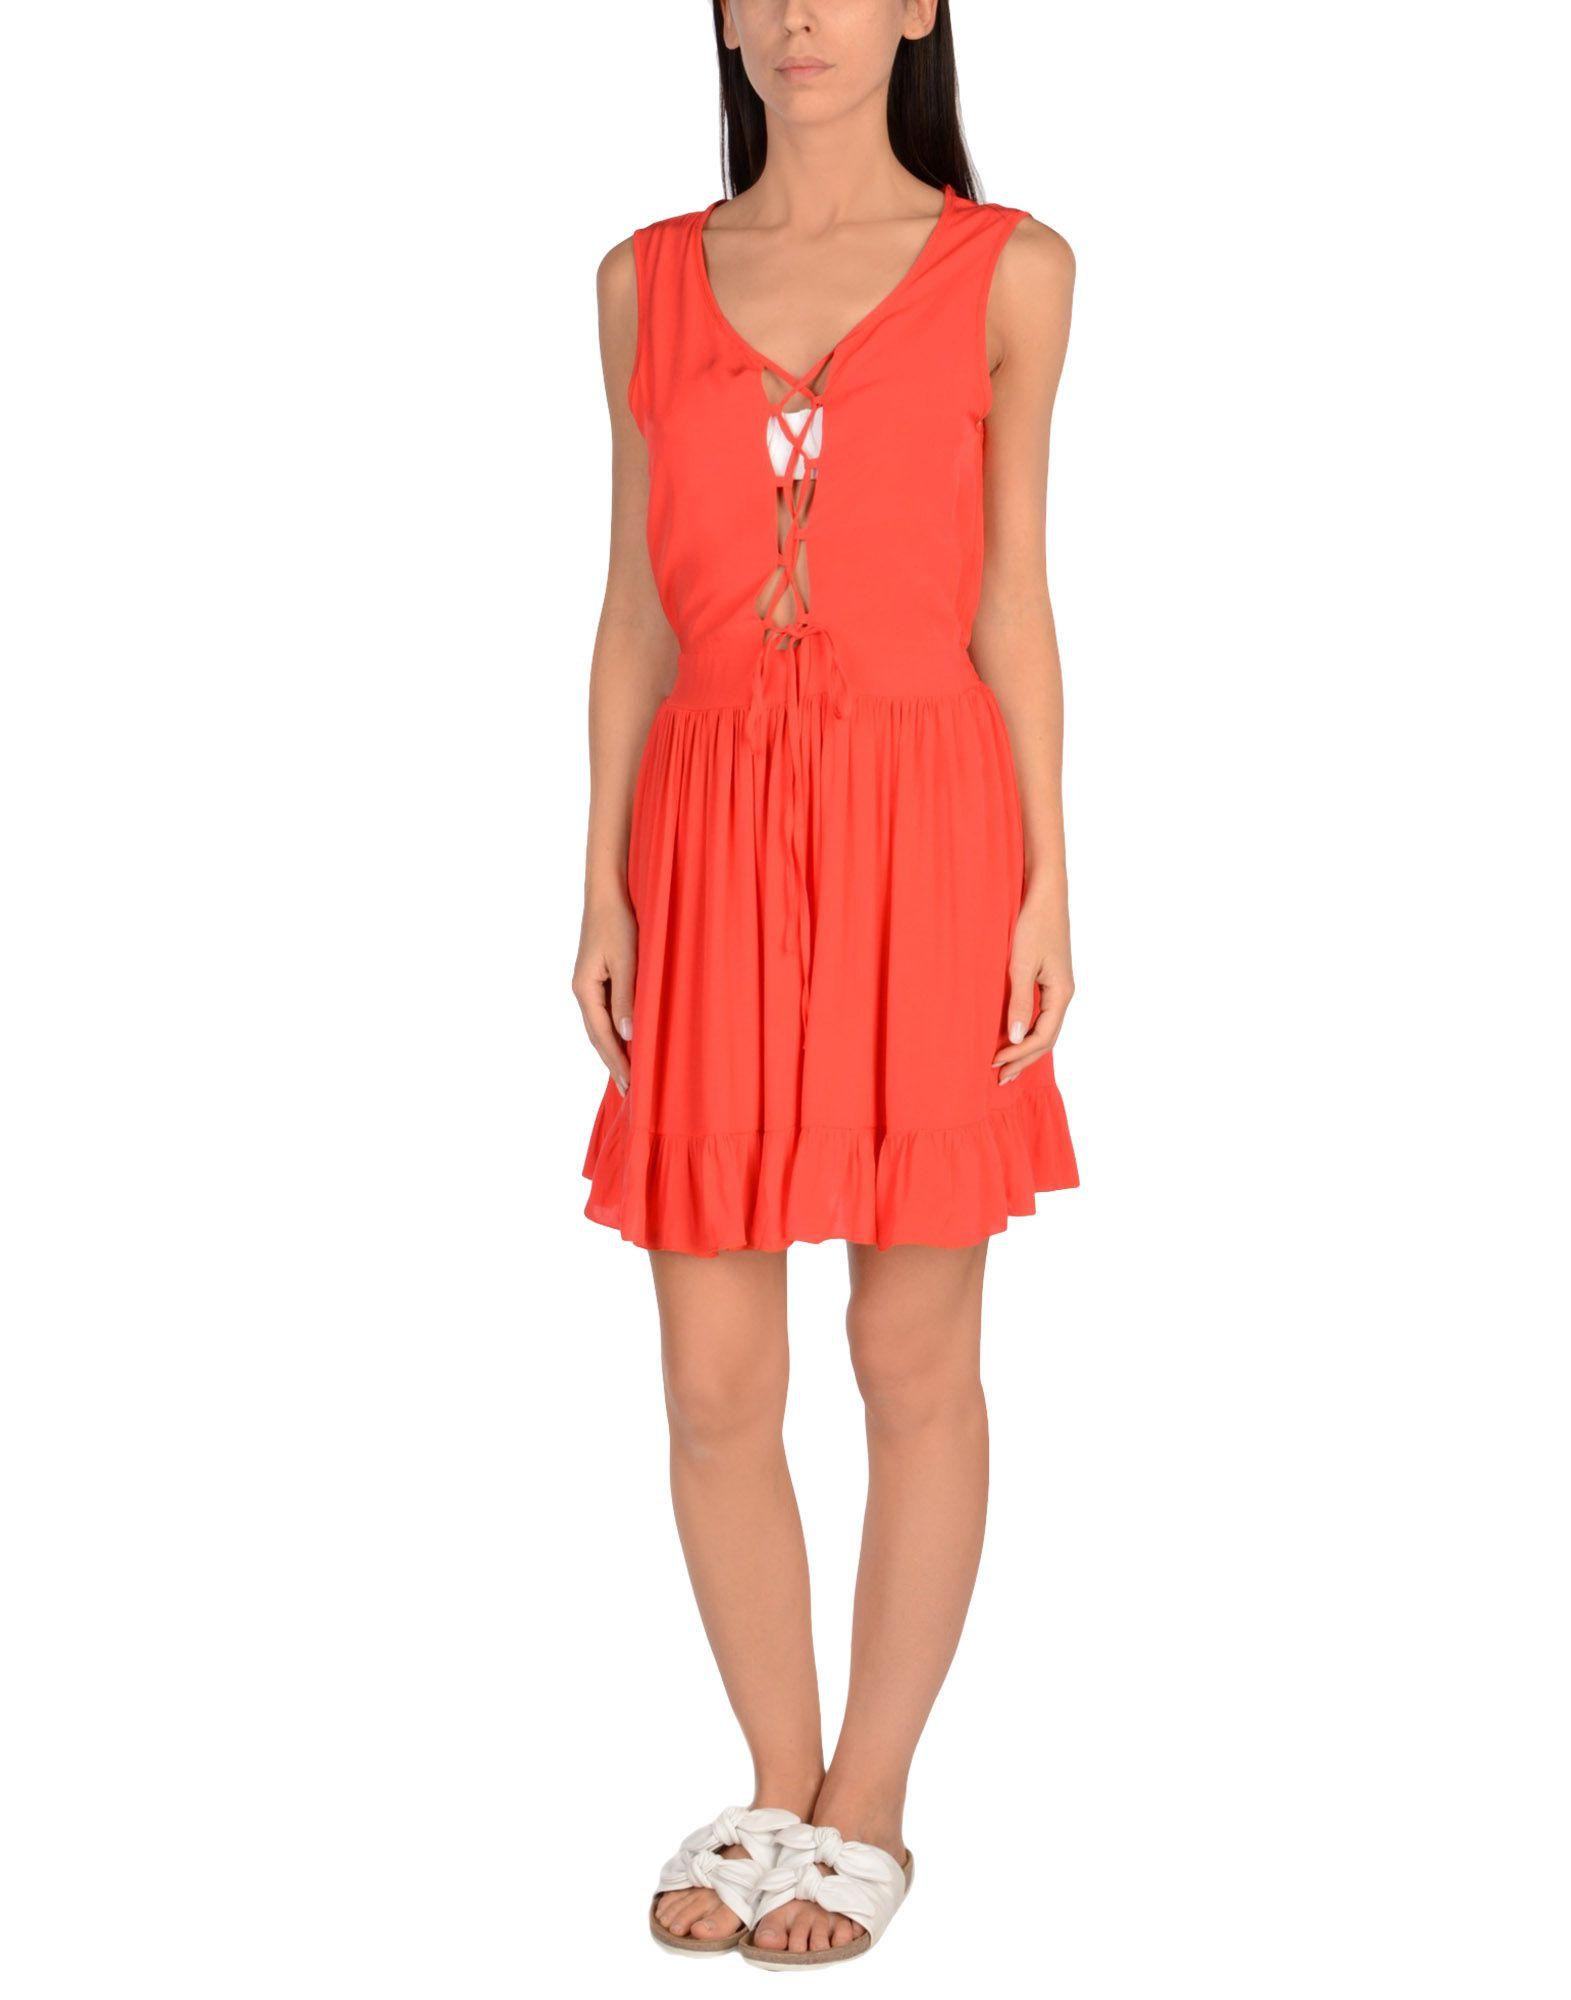 SUN SISTERS BEACHWEAR Пляжное платье sisters red